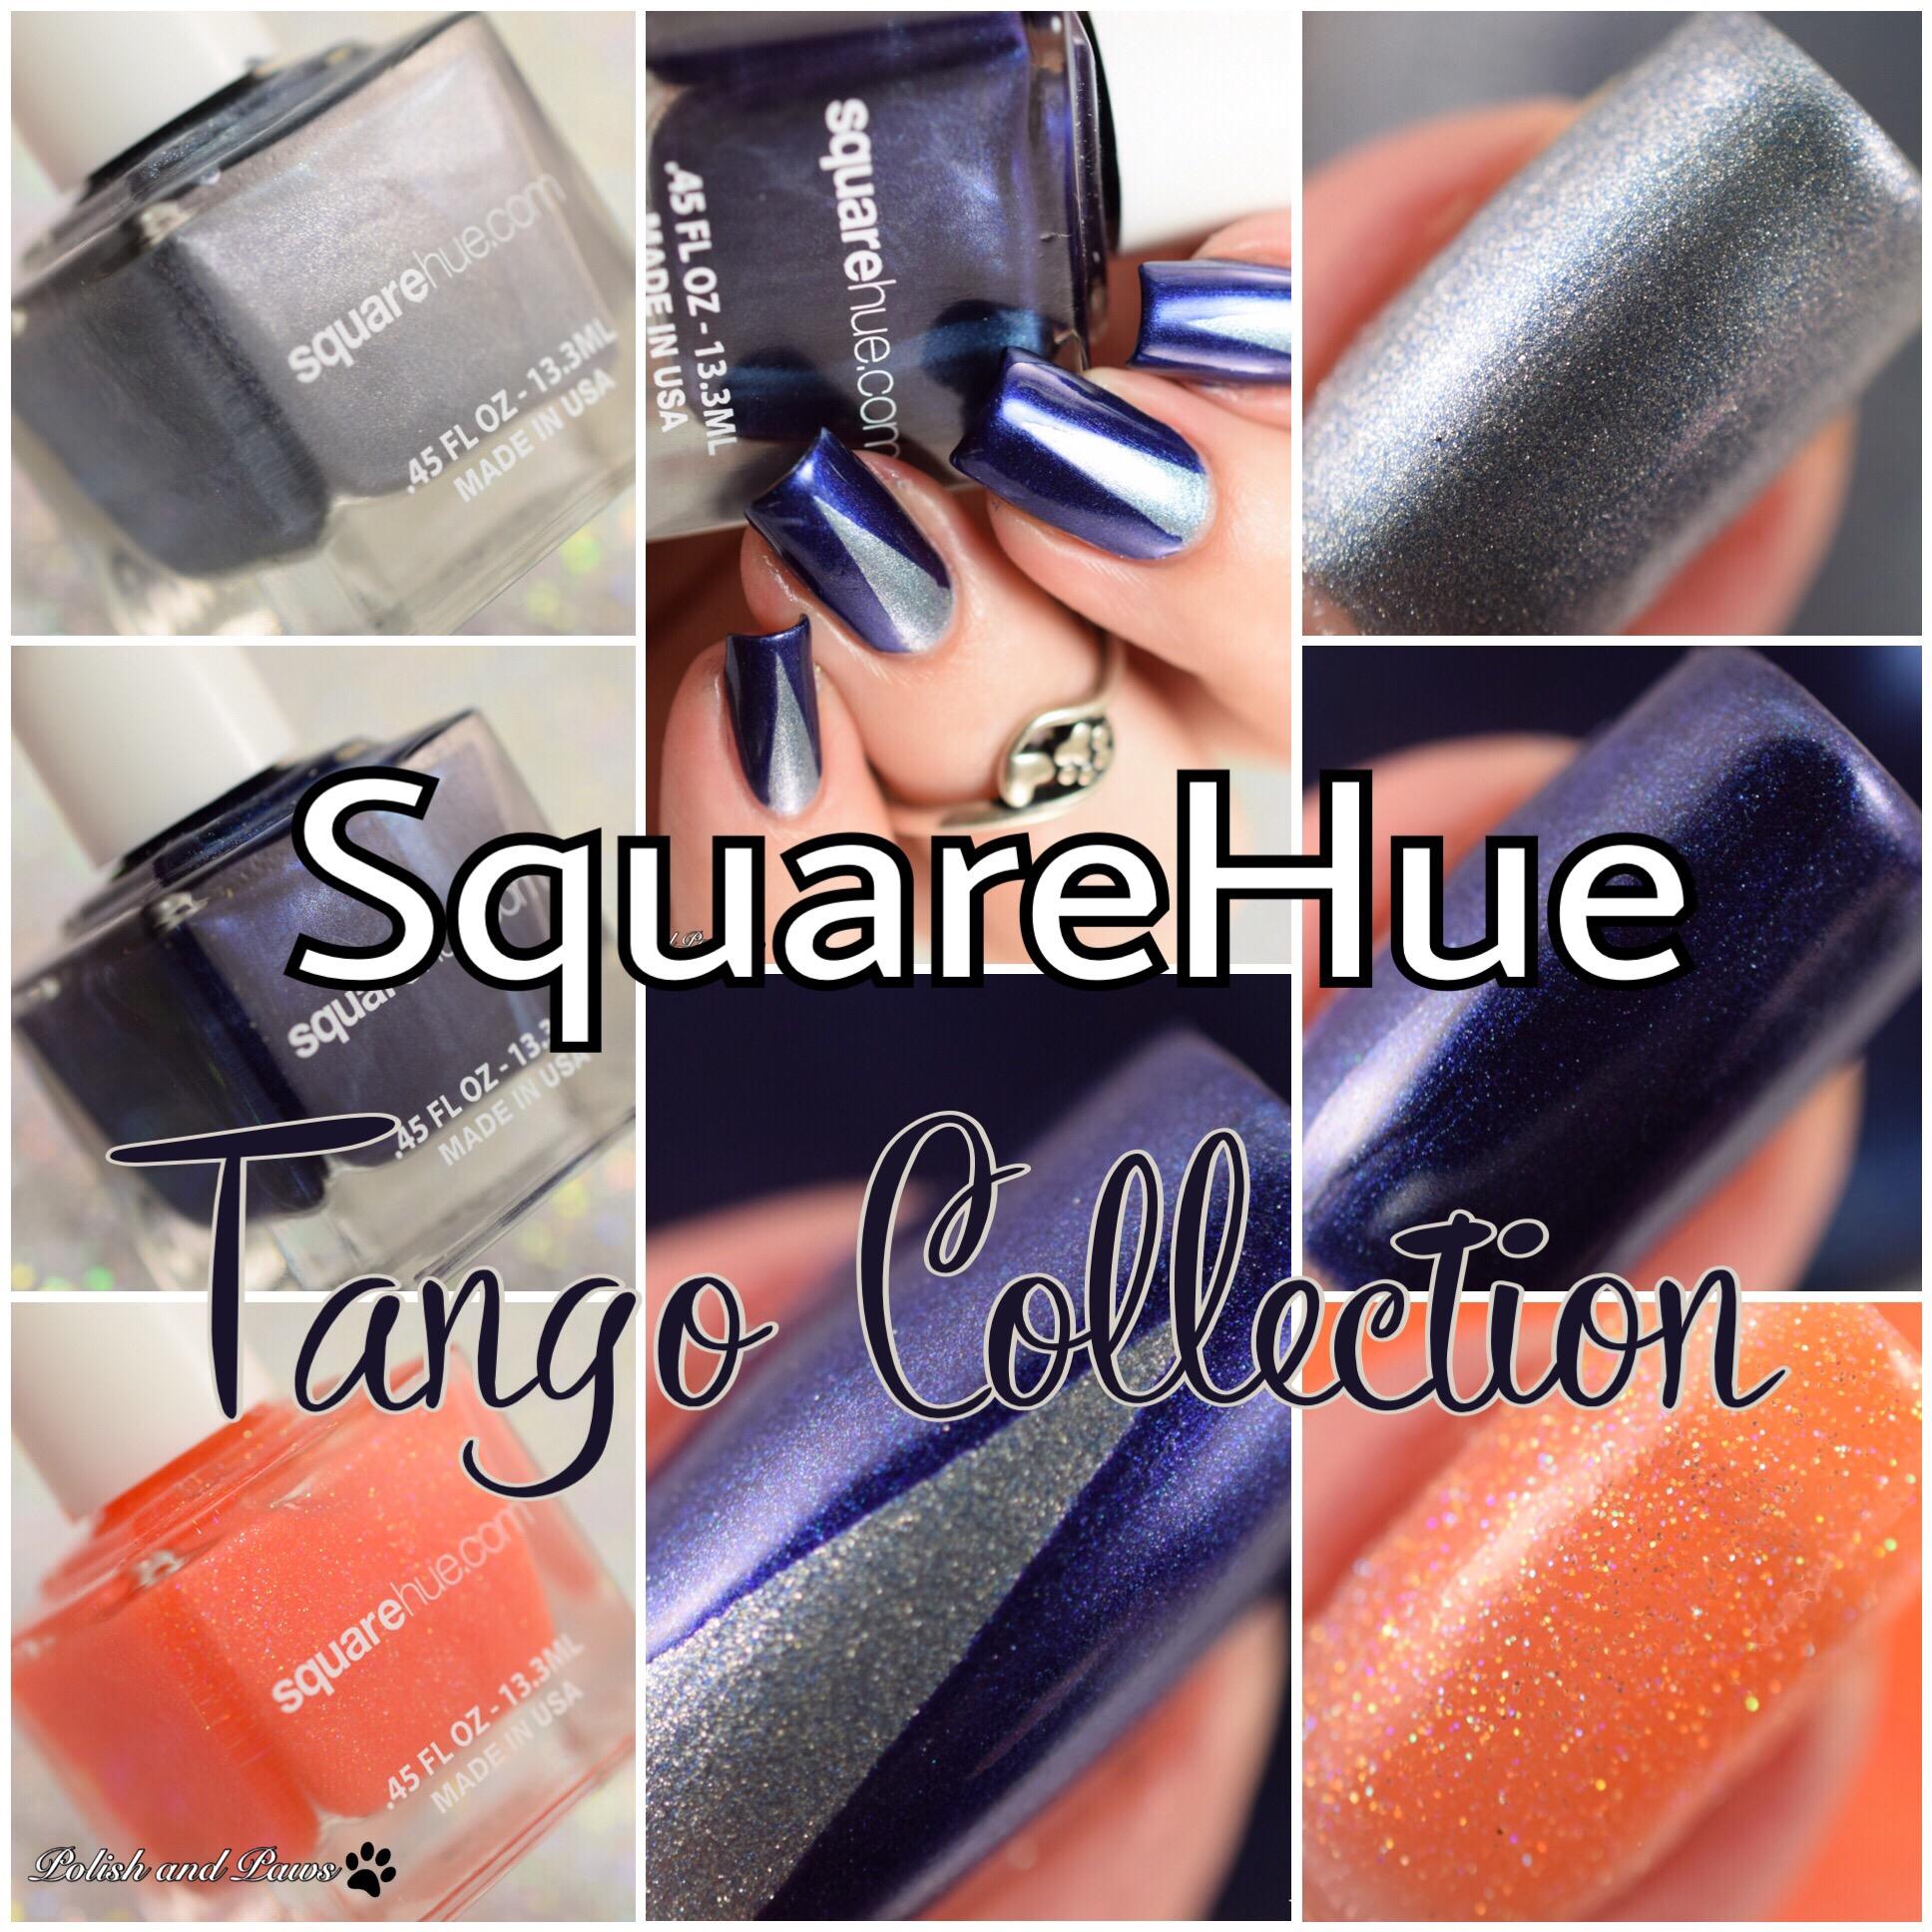 Square Hue Tango Collection